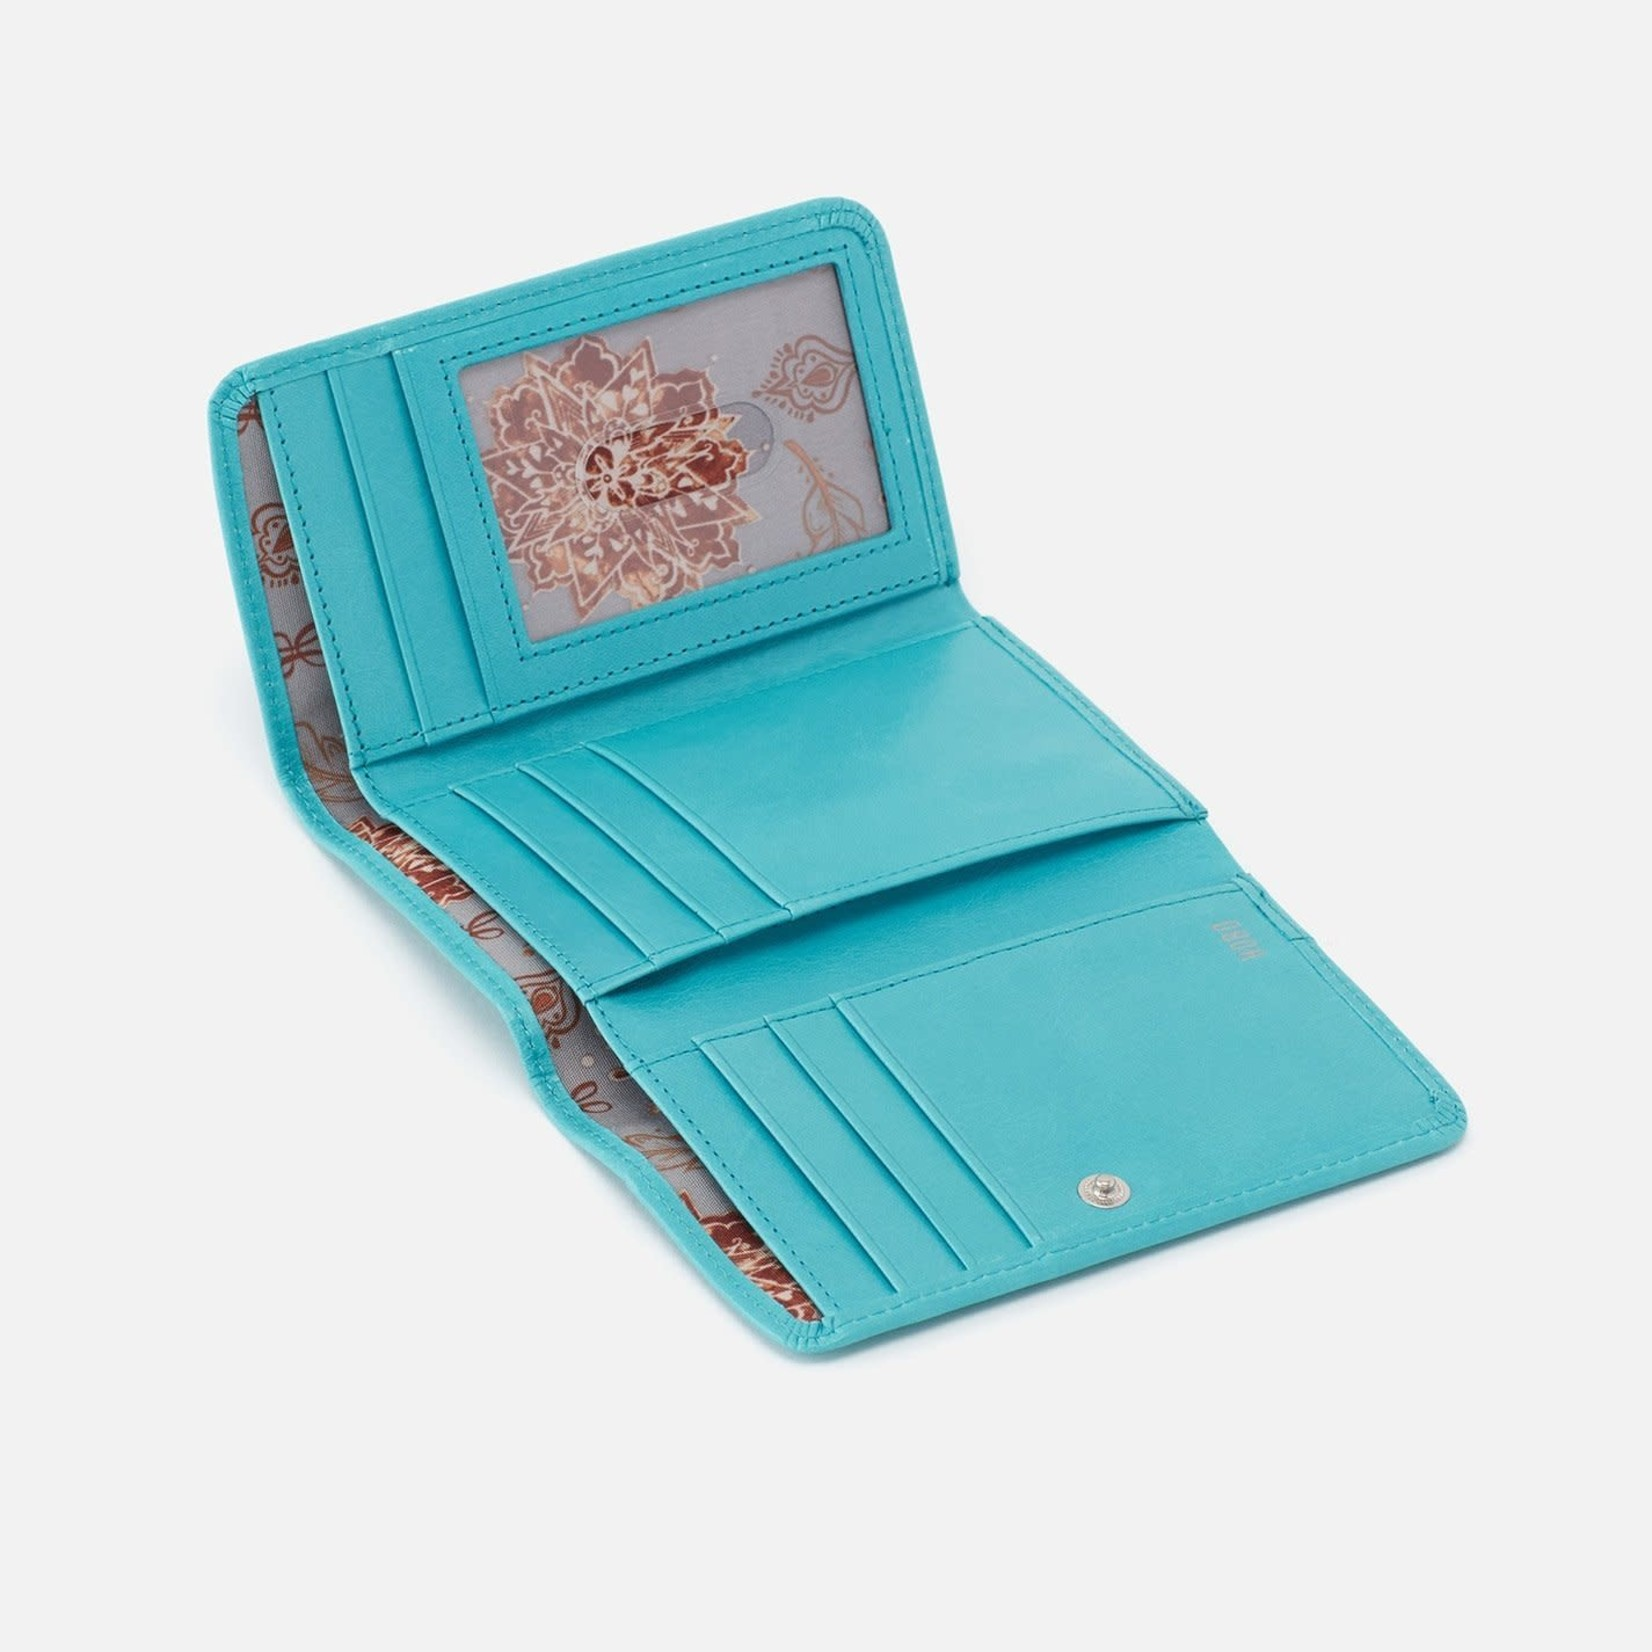 HOBO Jill Small Soft Leather Trifold Wallet - Aqua